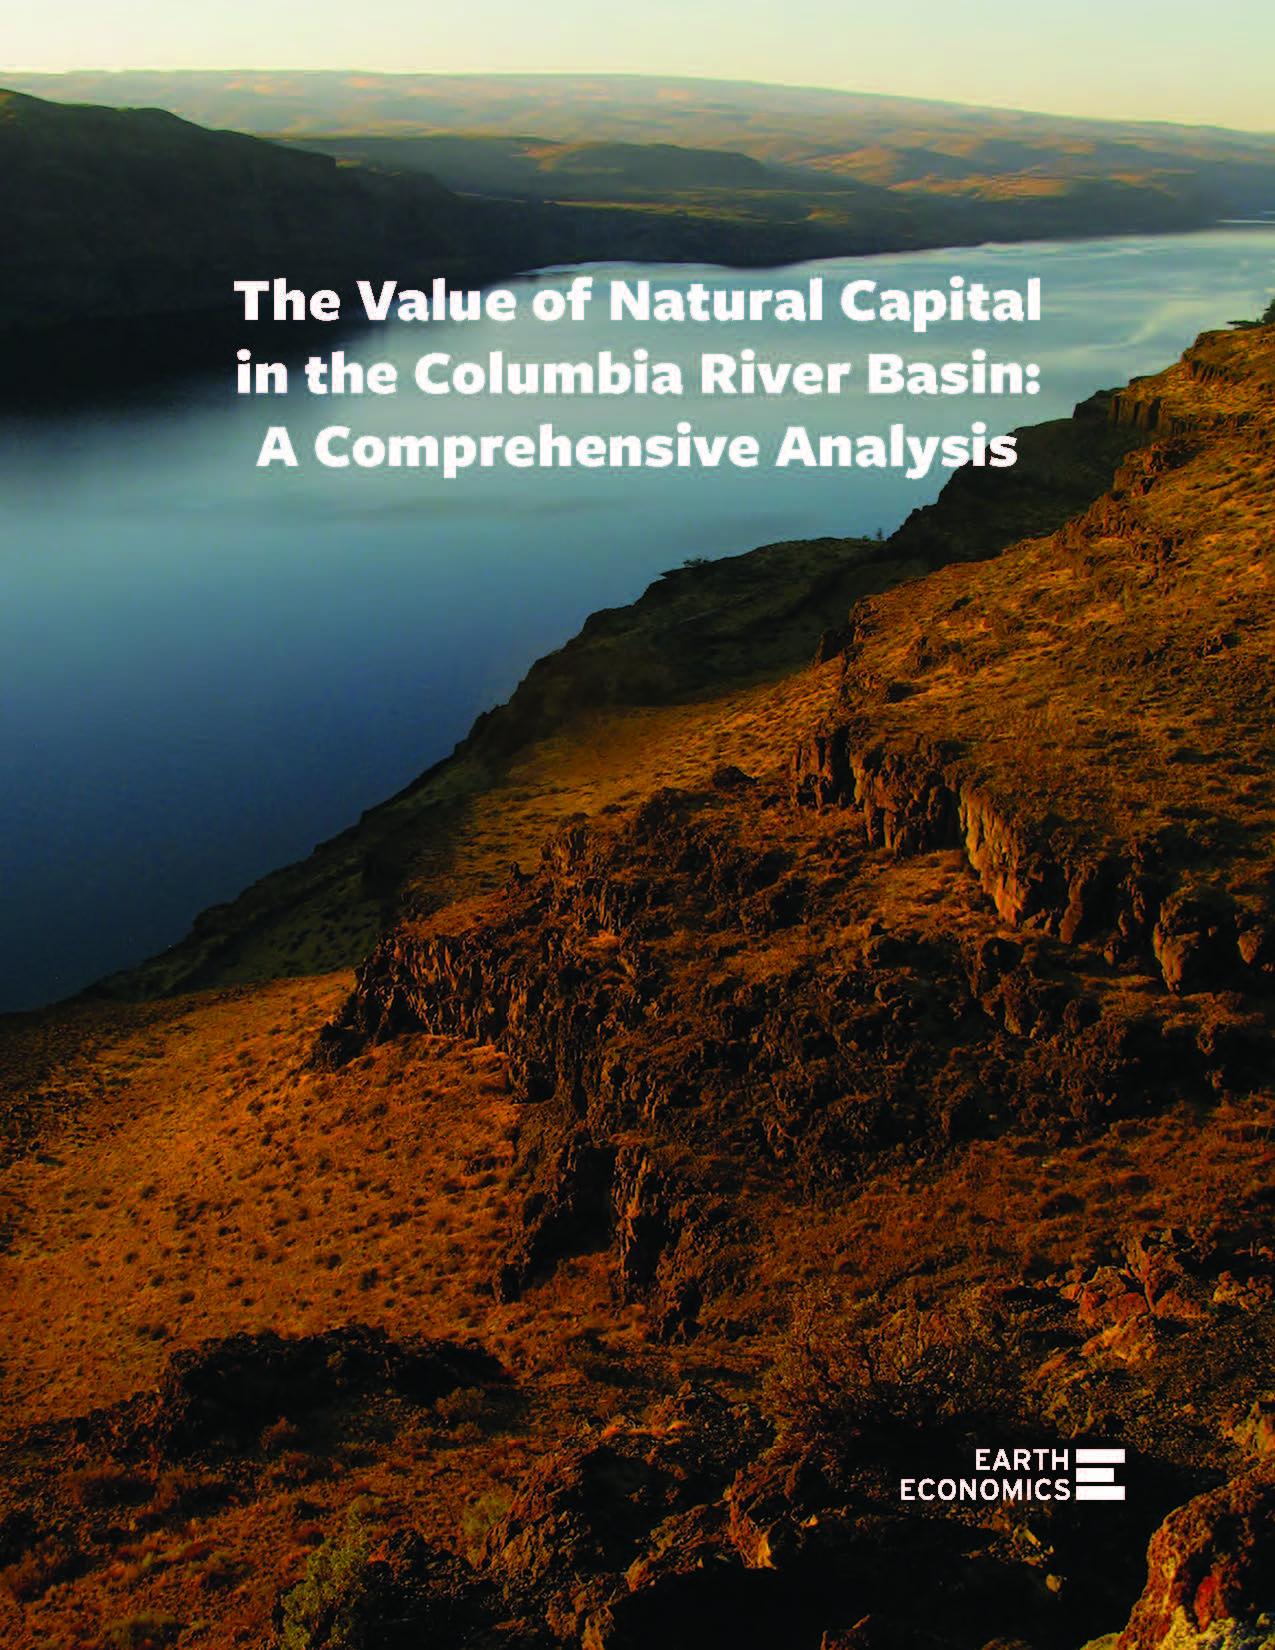 Cover_ValueofNaturalCapitalintheColumbiaRiverBasin_EarthEconomics_Jan2018.jpg